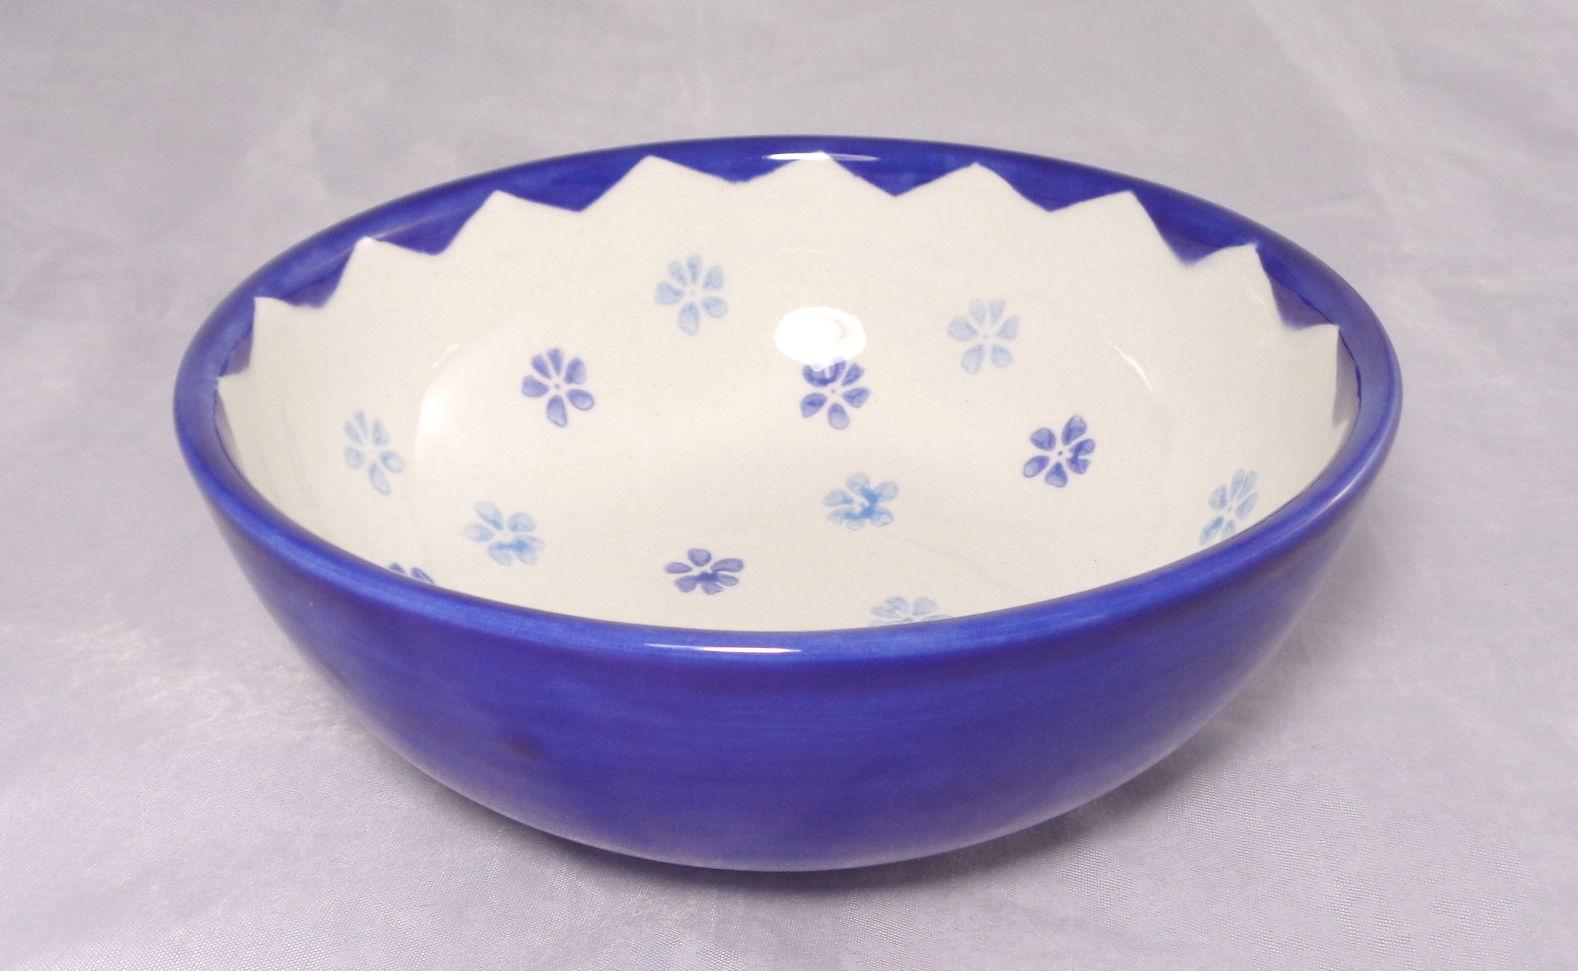 Bemalte Keramik blaue Müslischale Stemps No 4